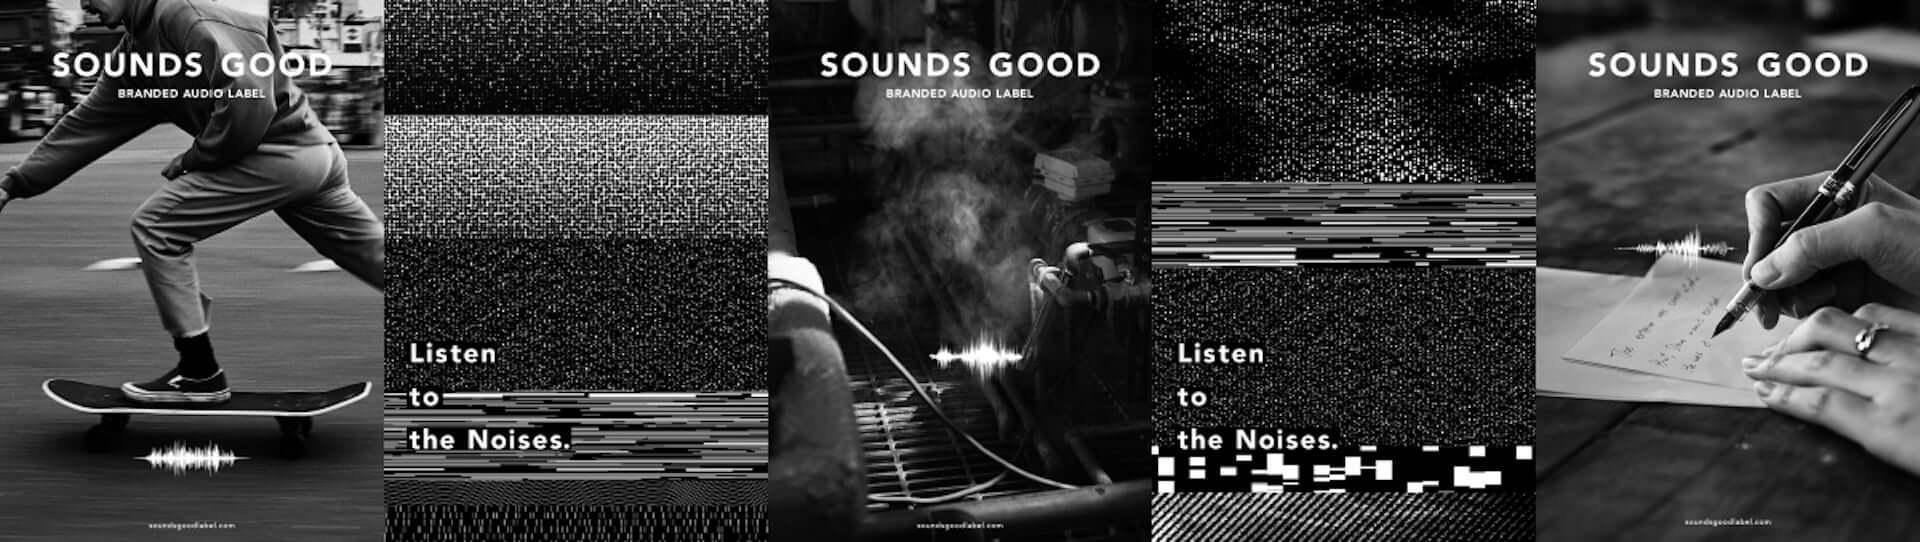 SOUNDS GOOD®︎とblock.fmのコラボ特番が本日放送|80KIDZ、TAAR、Shin Sakiuraが「ホームサンプリング」 music200527_soundsgood_6-1920x542